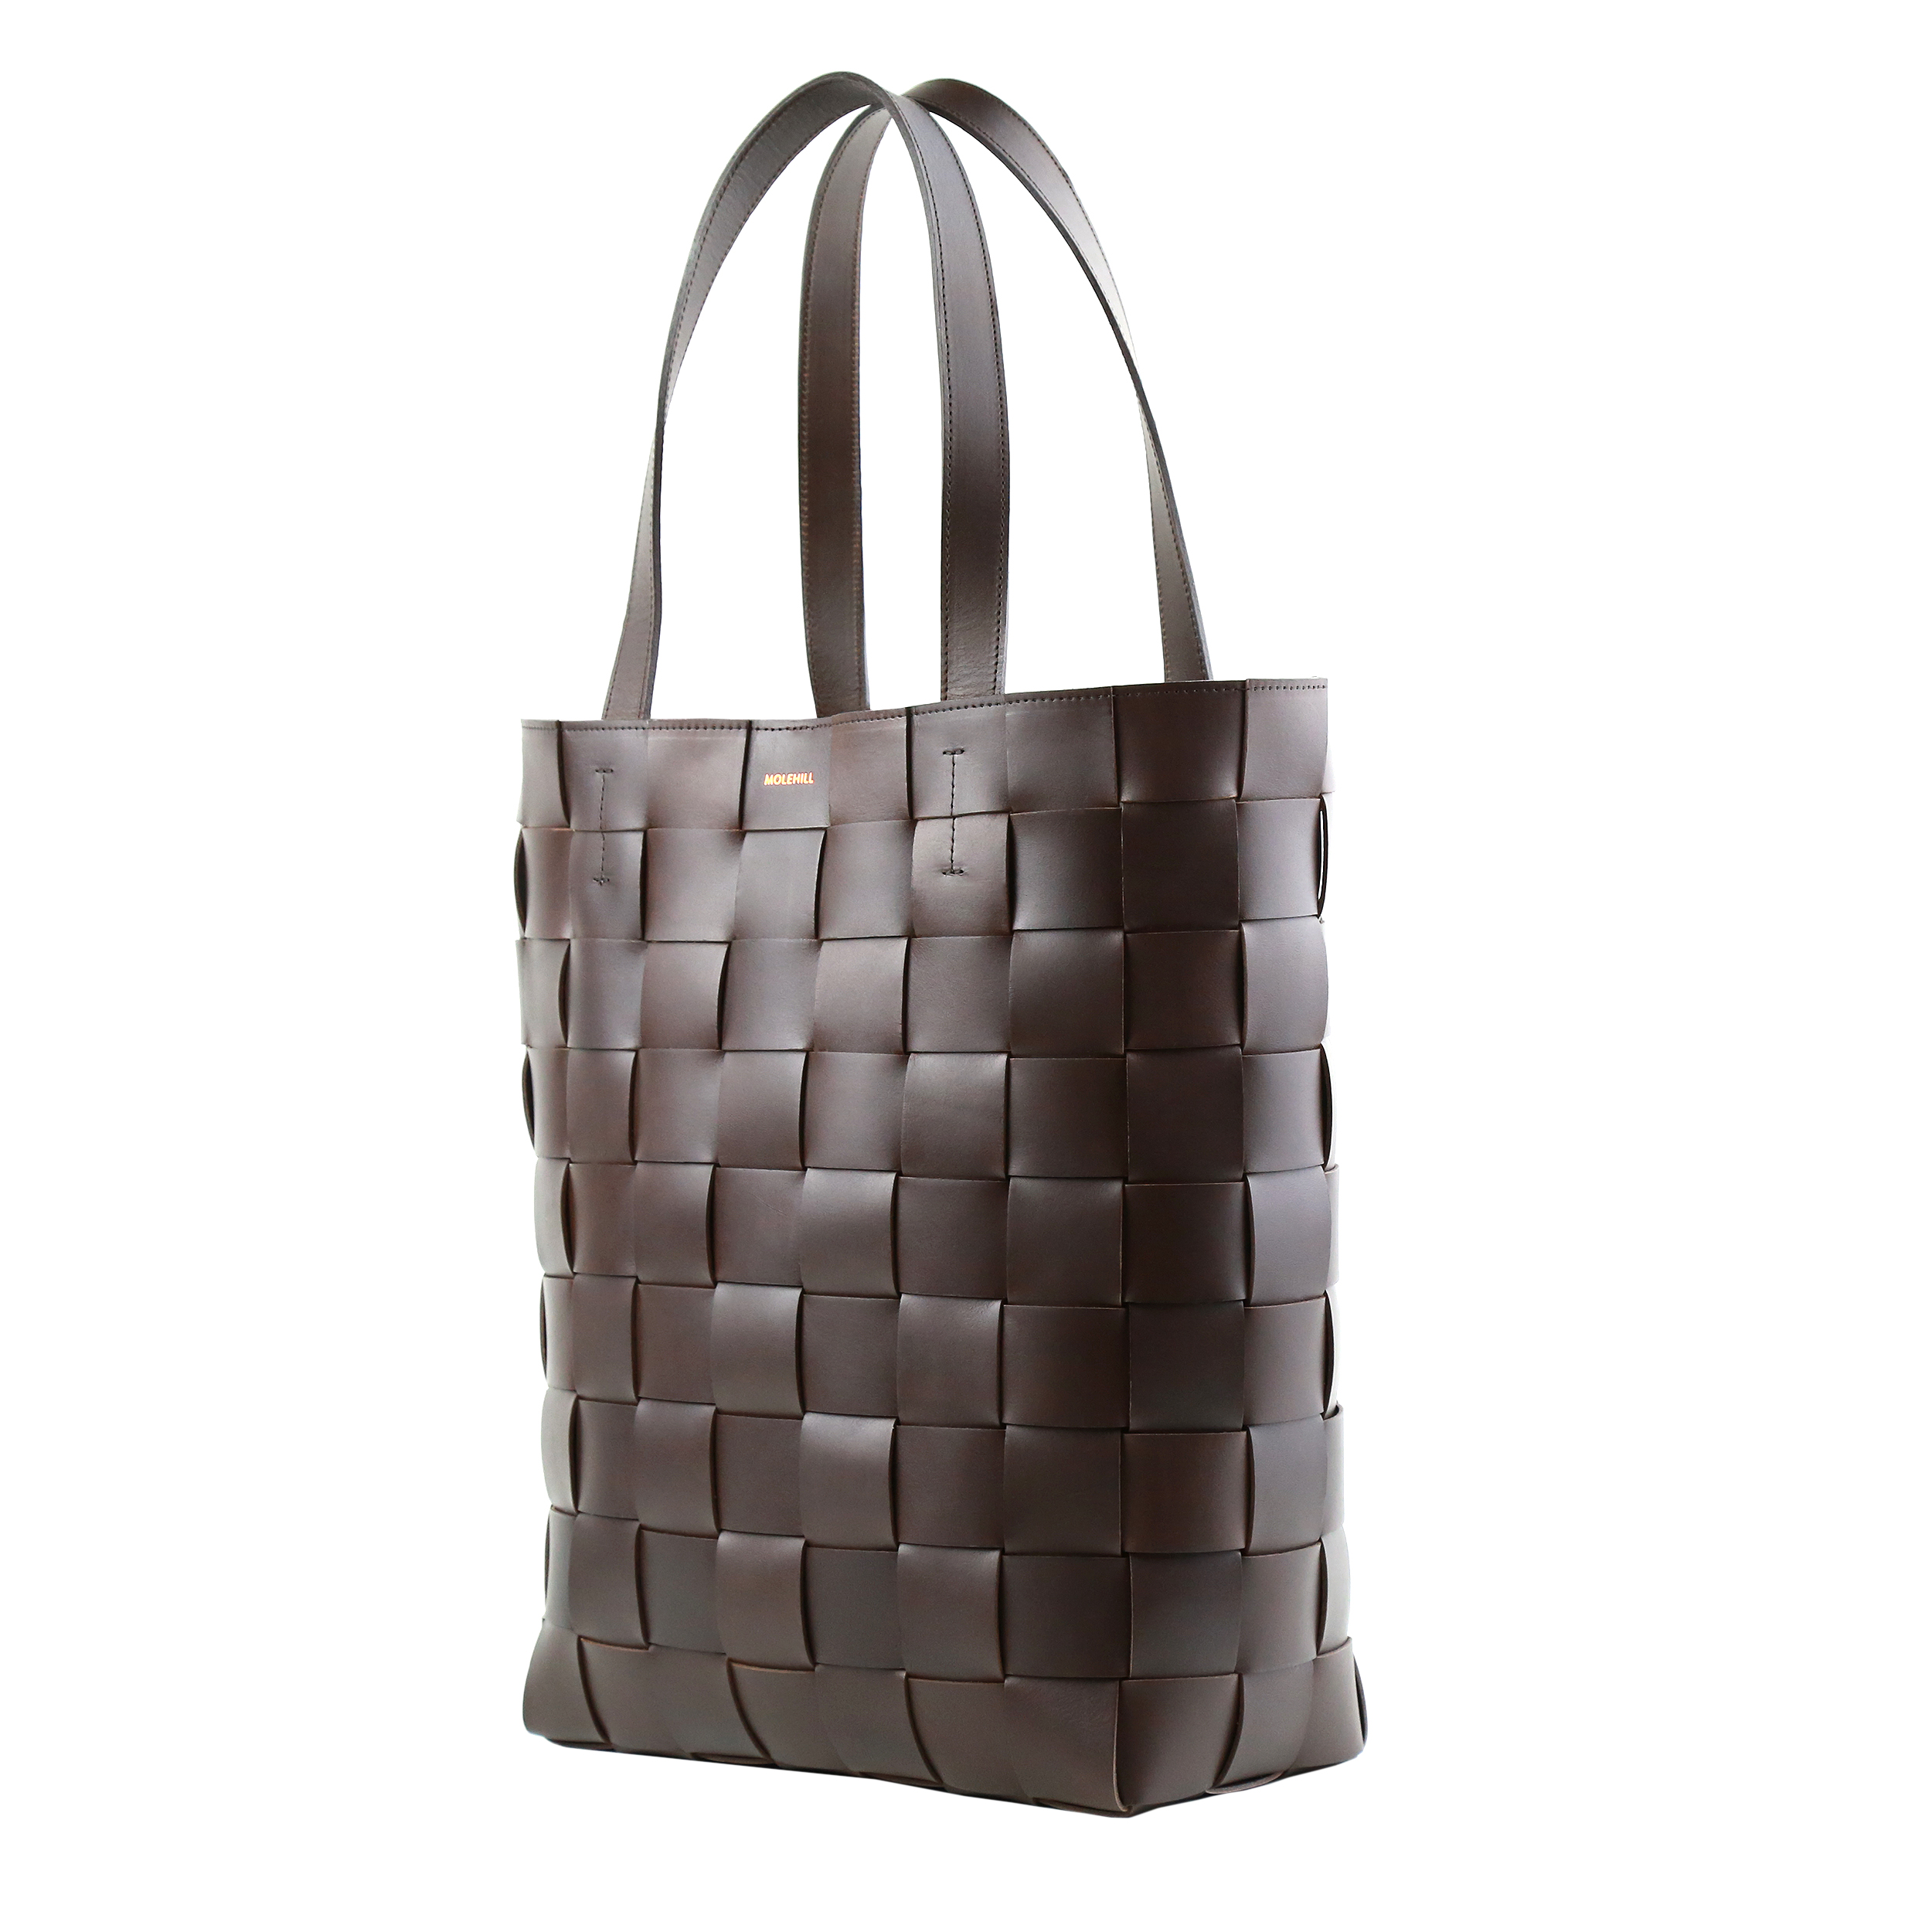 Pane Shopper Woven Bag Vertical Dark Chocolate-2